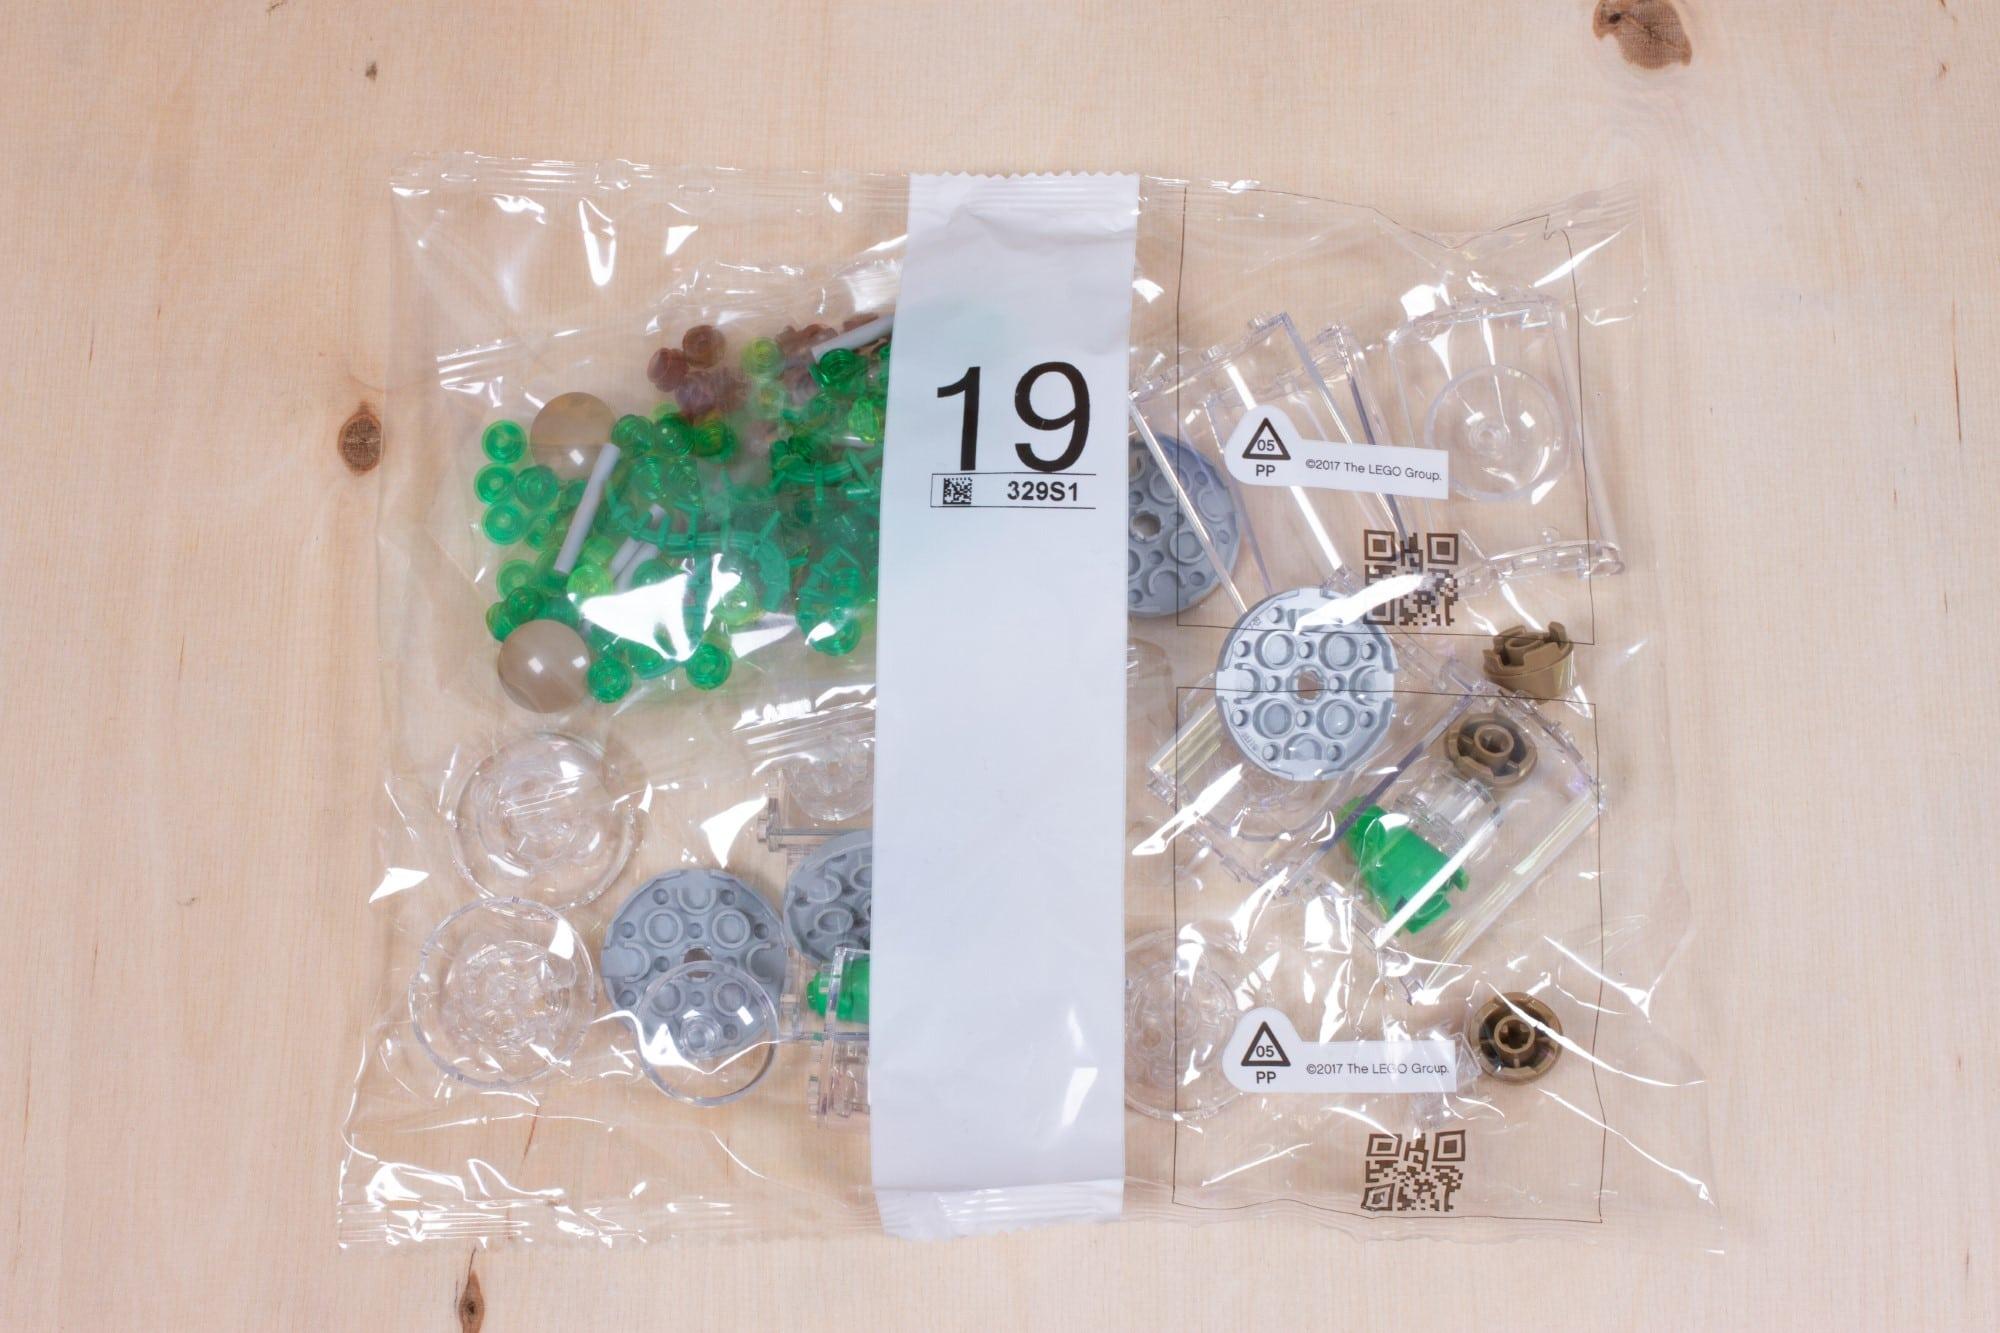 LEGO 76391 Hogwarts Icons Review Unboxing 1 Schritt 19